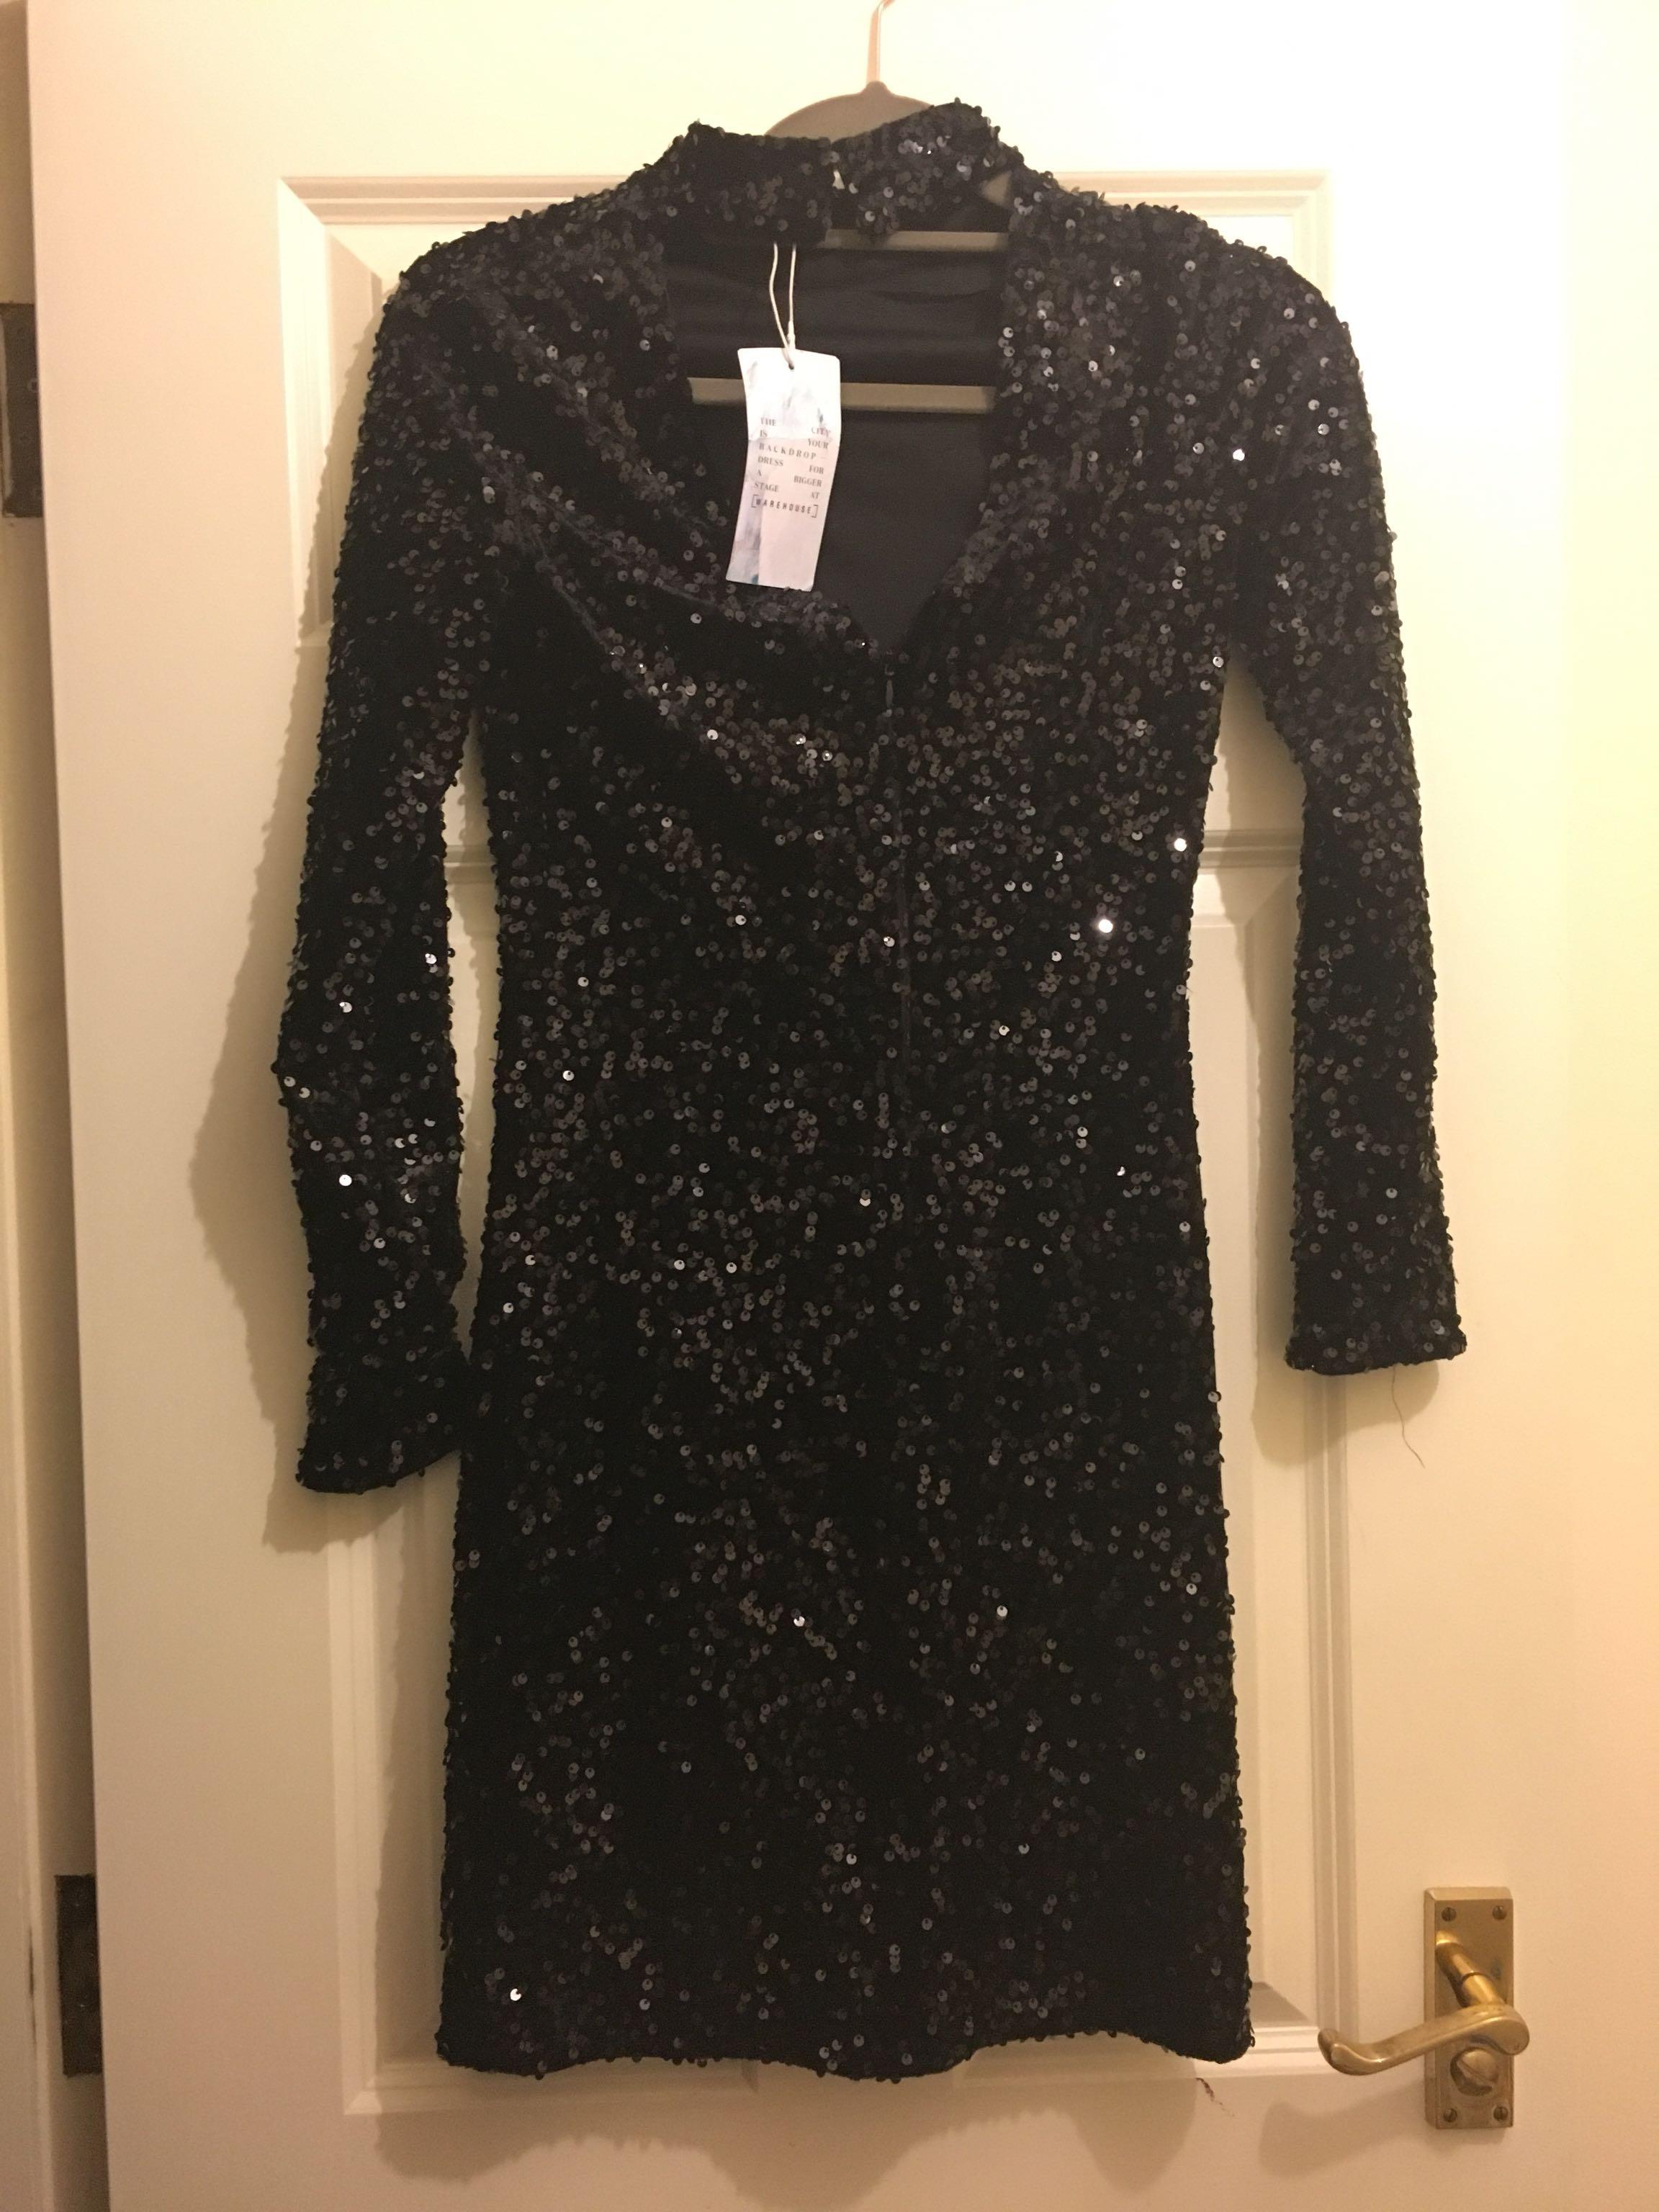 Warehouse dress size 8 never worn